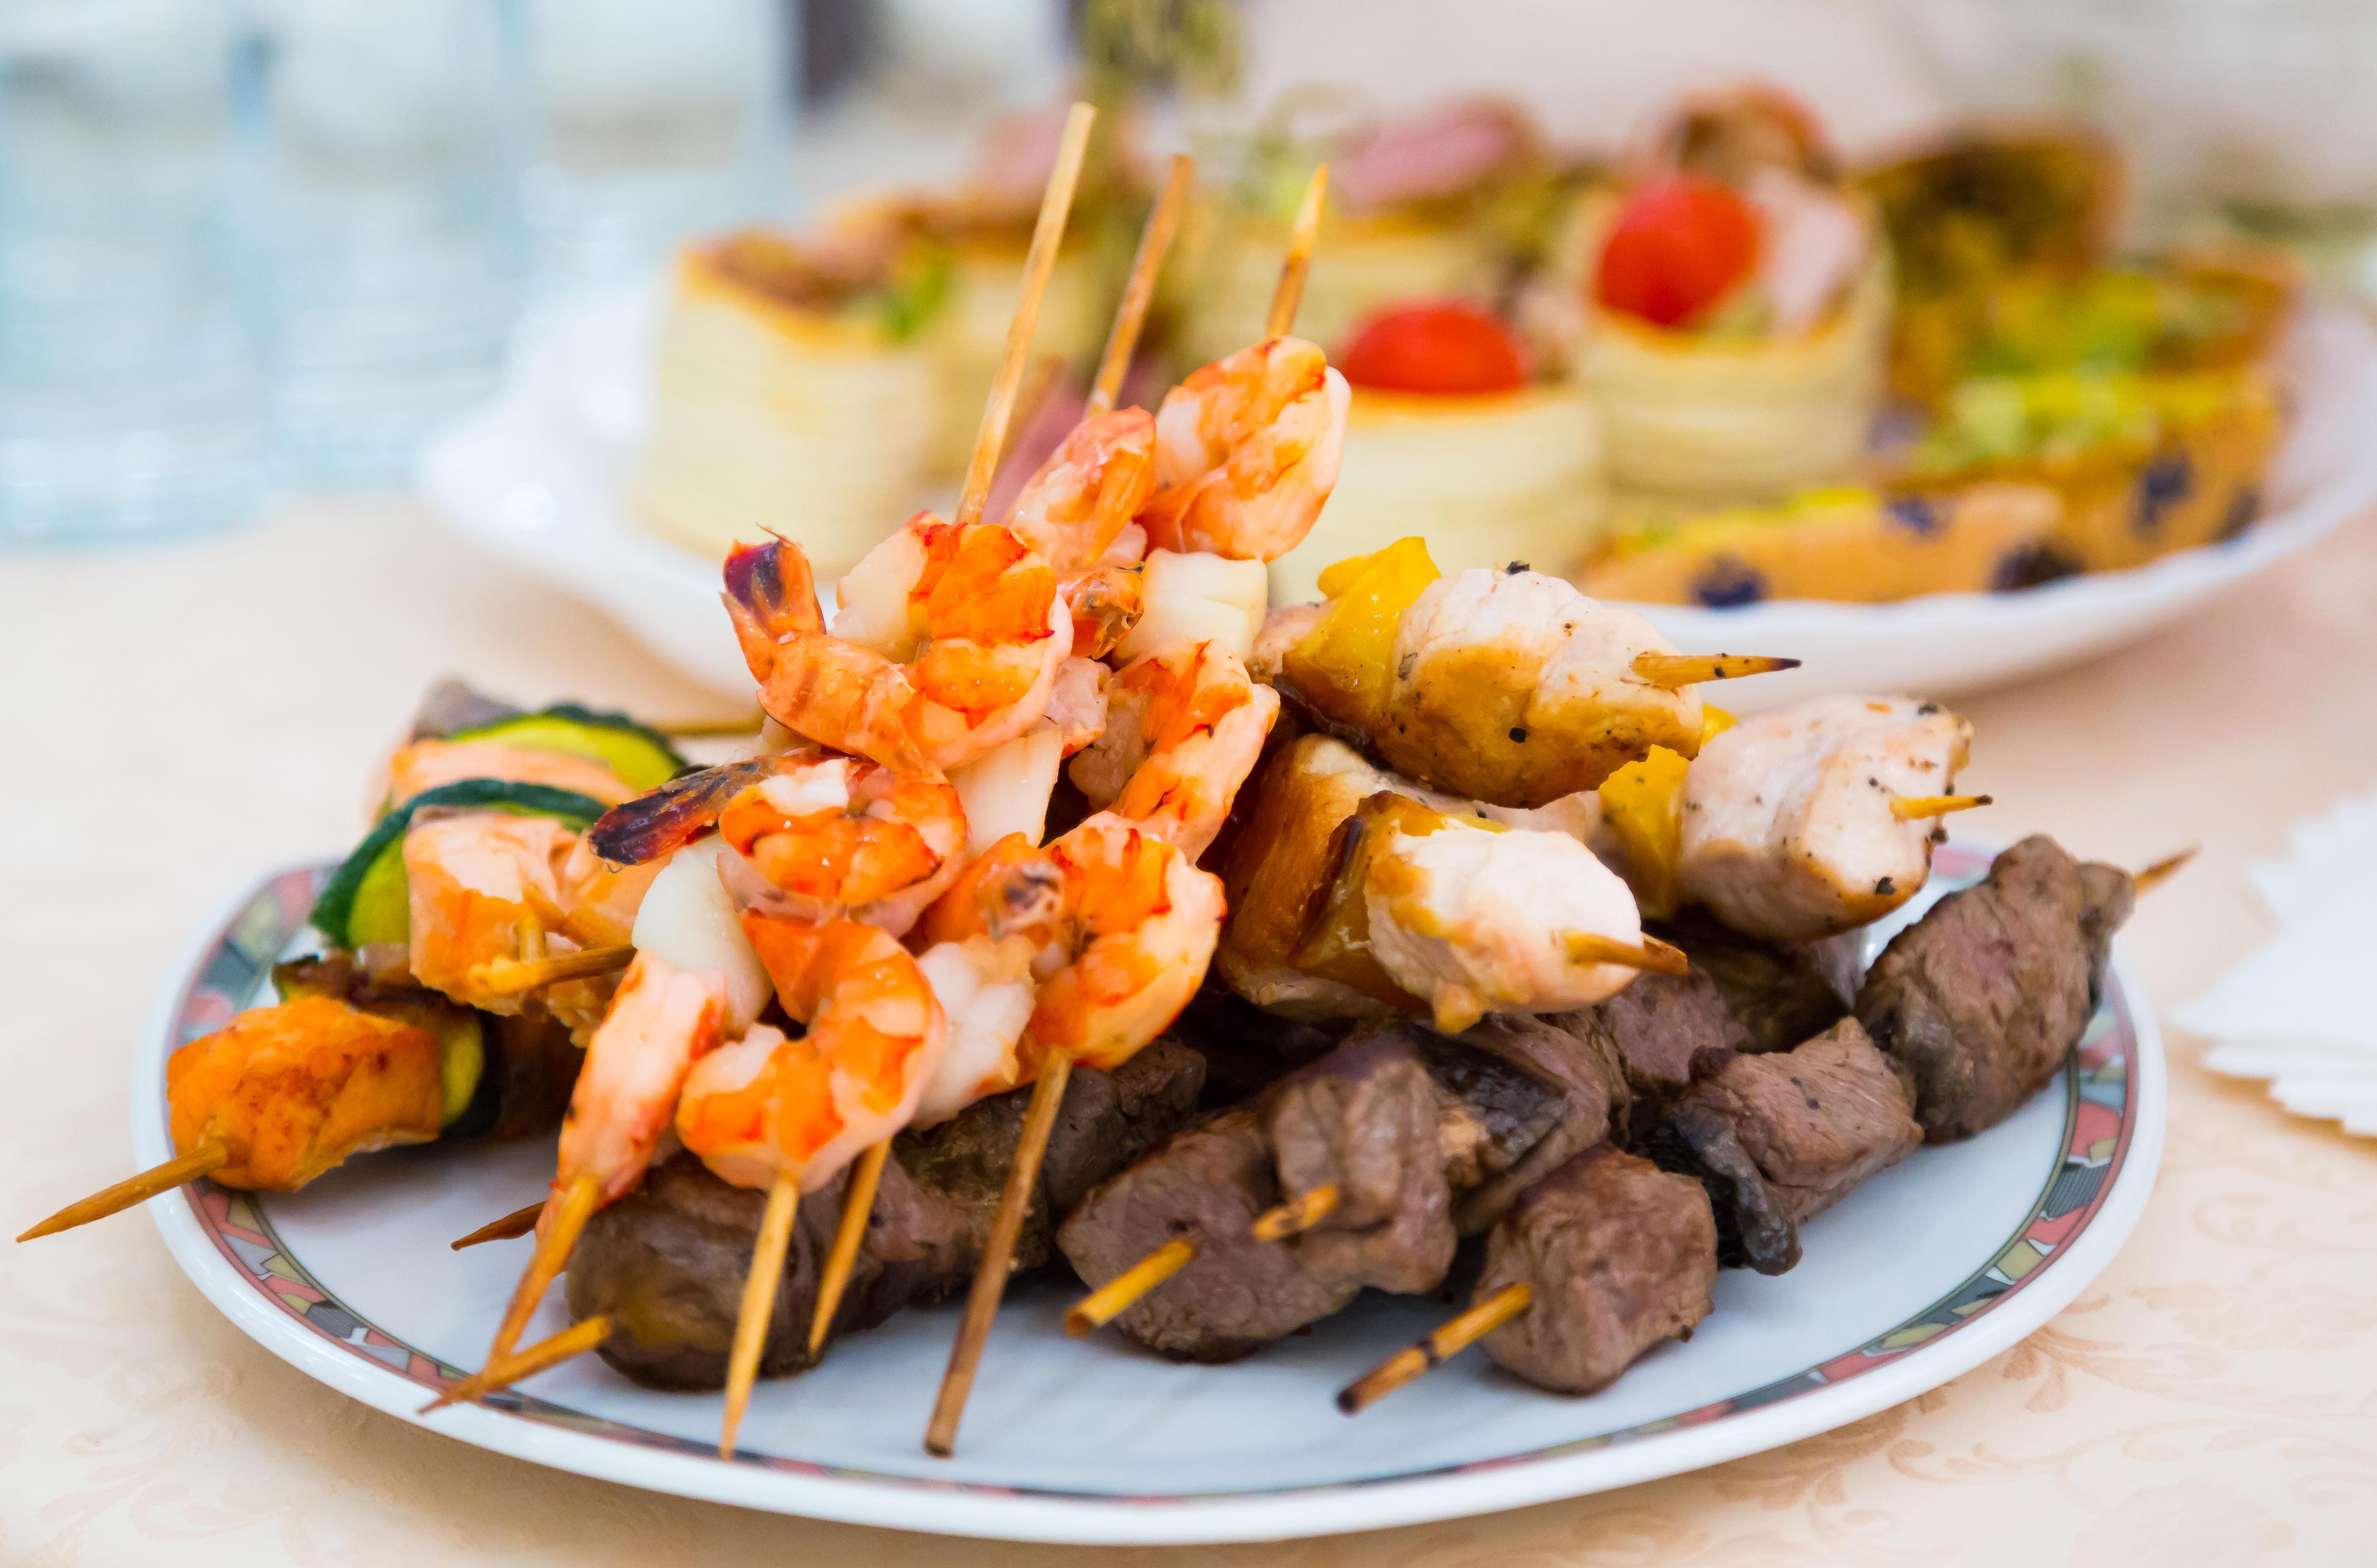 Voila Gourmet Catering image 4